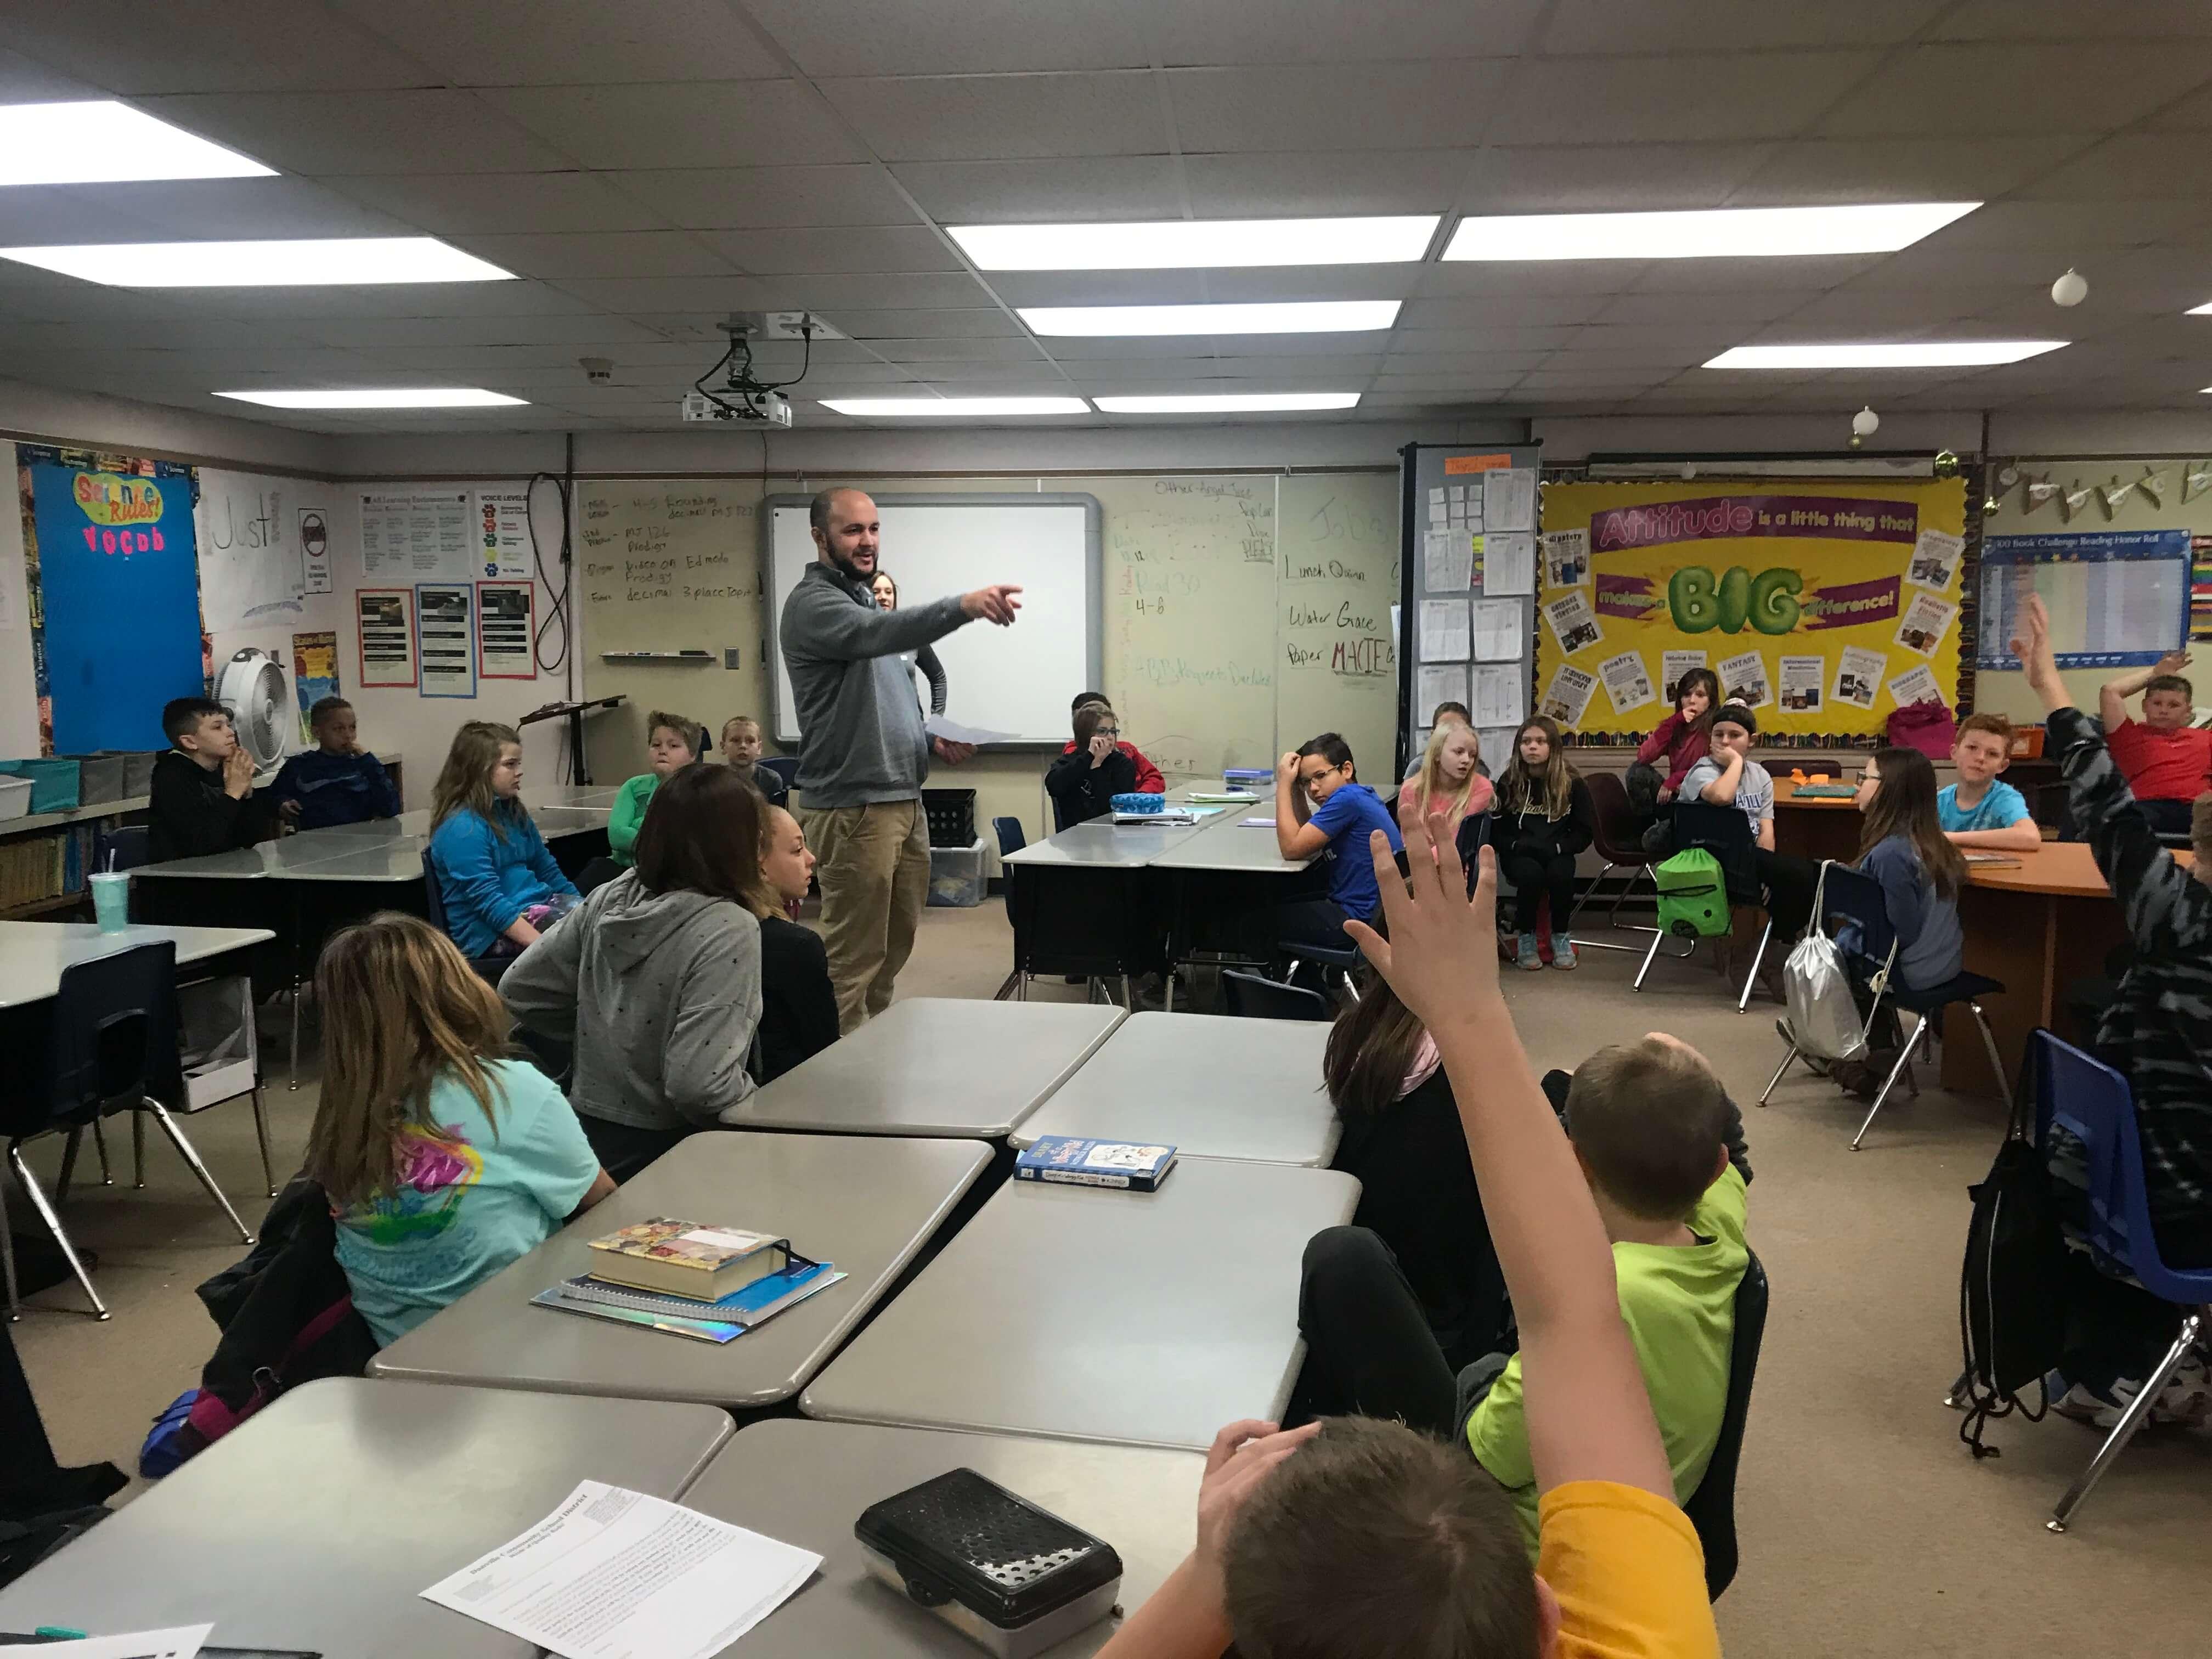 teacher calls on students raising their hands